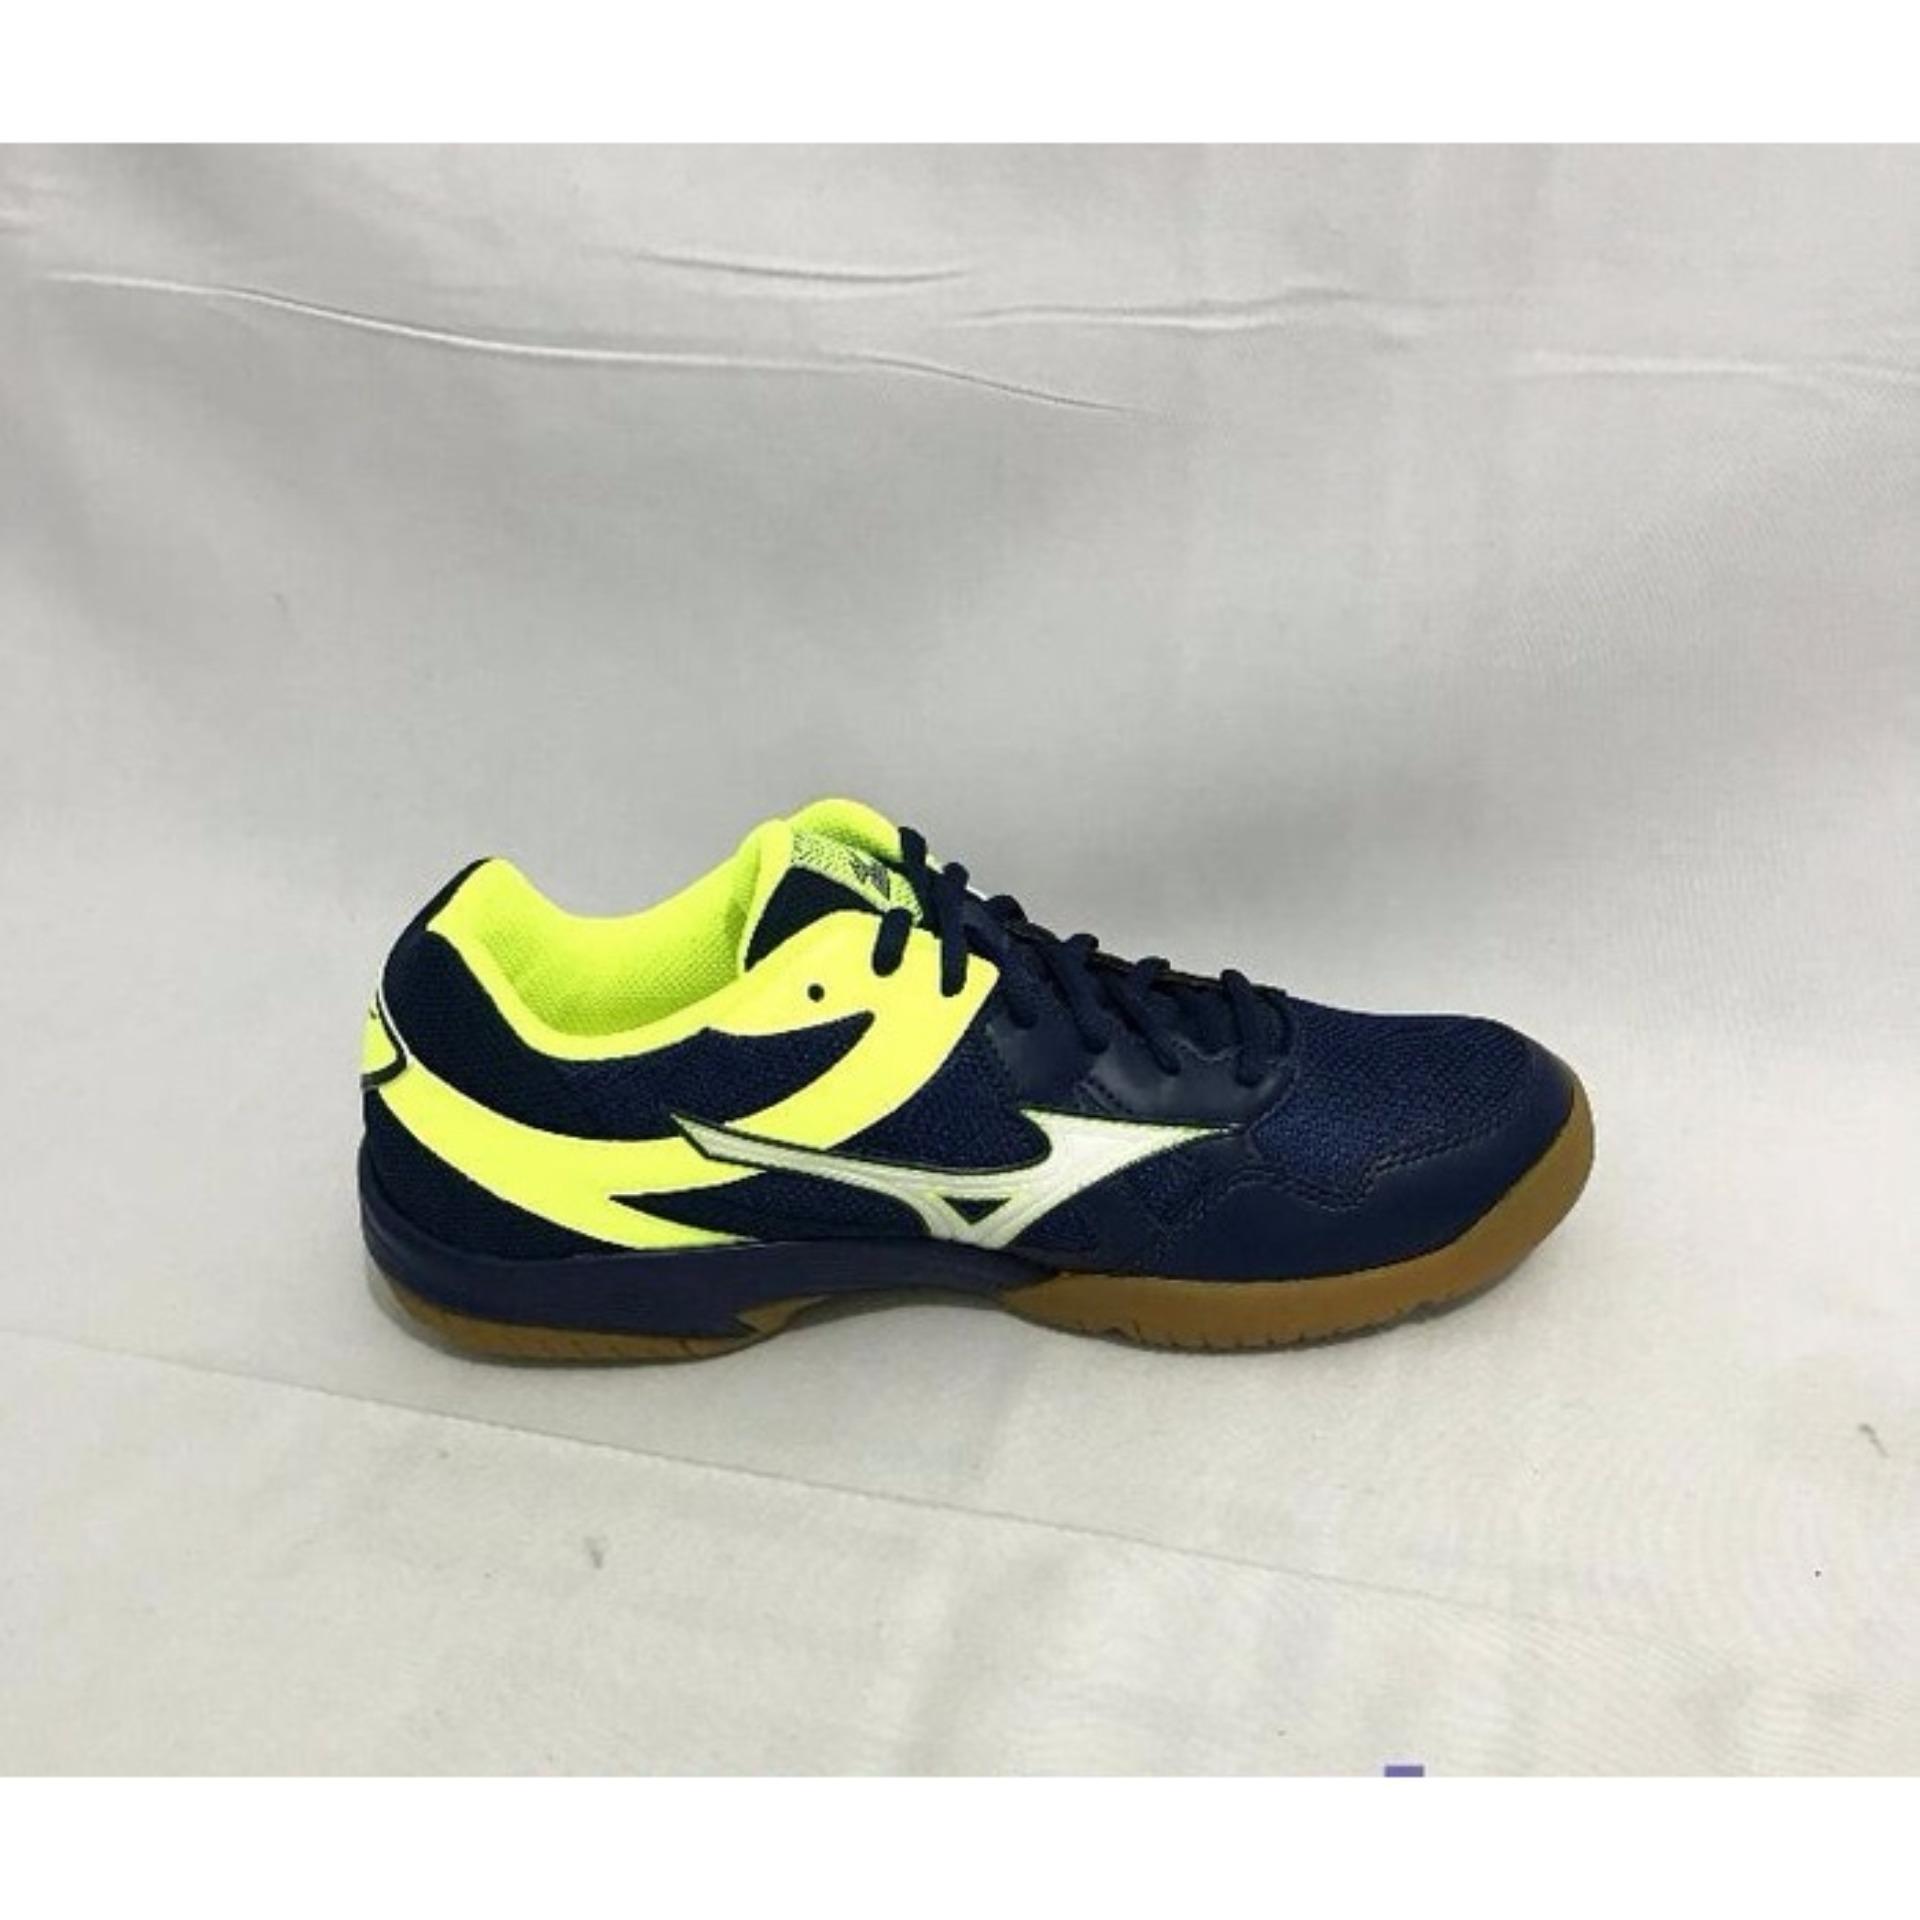 Diskon Penjualan Sepatu Voli Mizuno Cyclone Speed Blue Depths Futsal Sala Classic 2 In Yellow White Safety